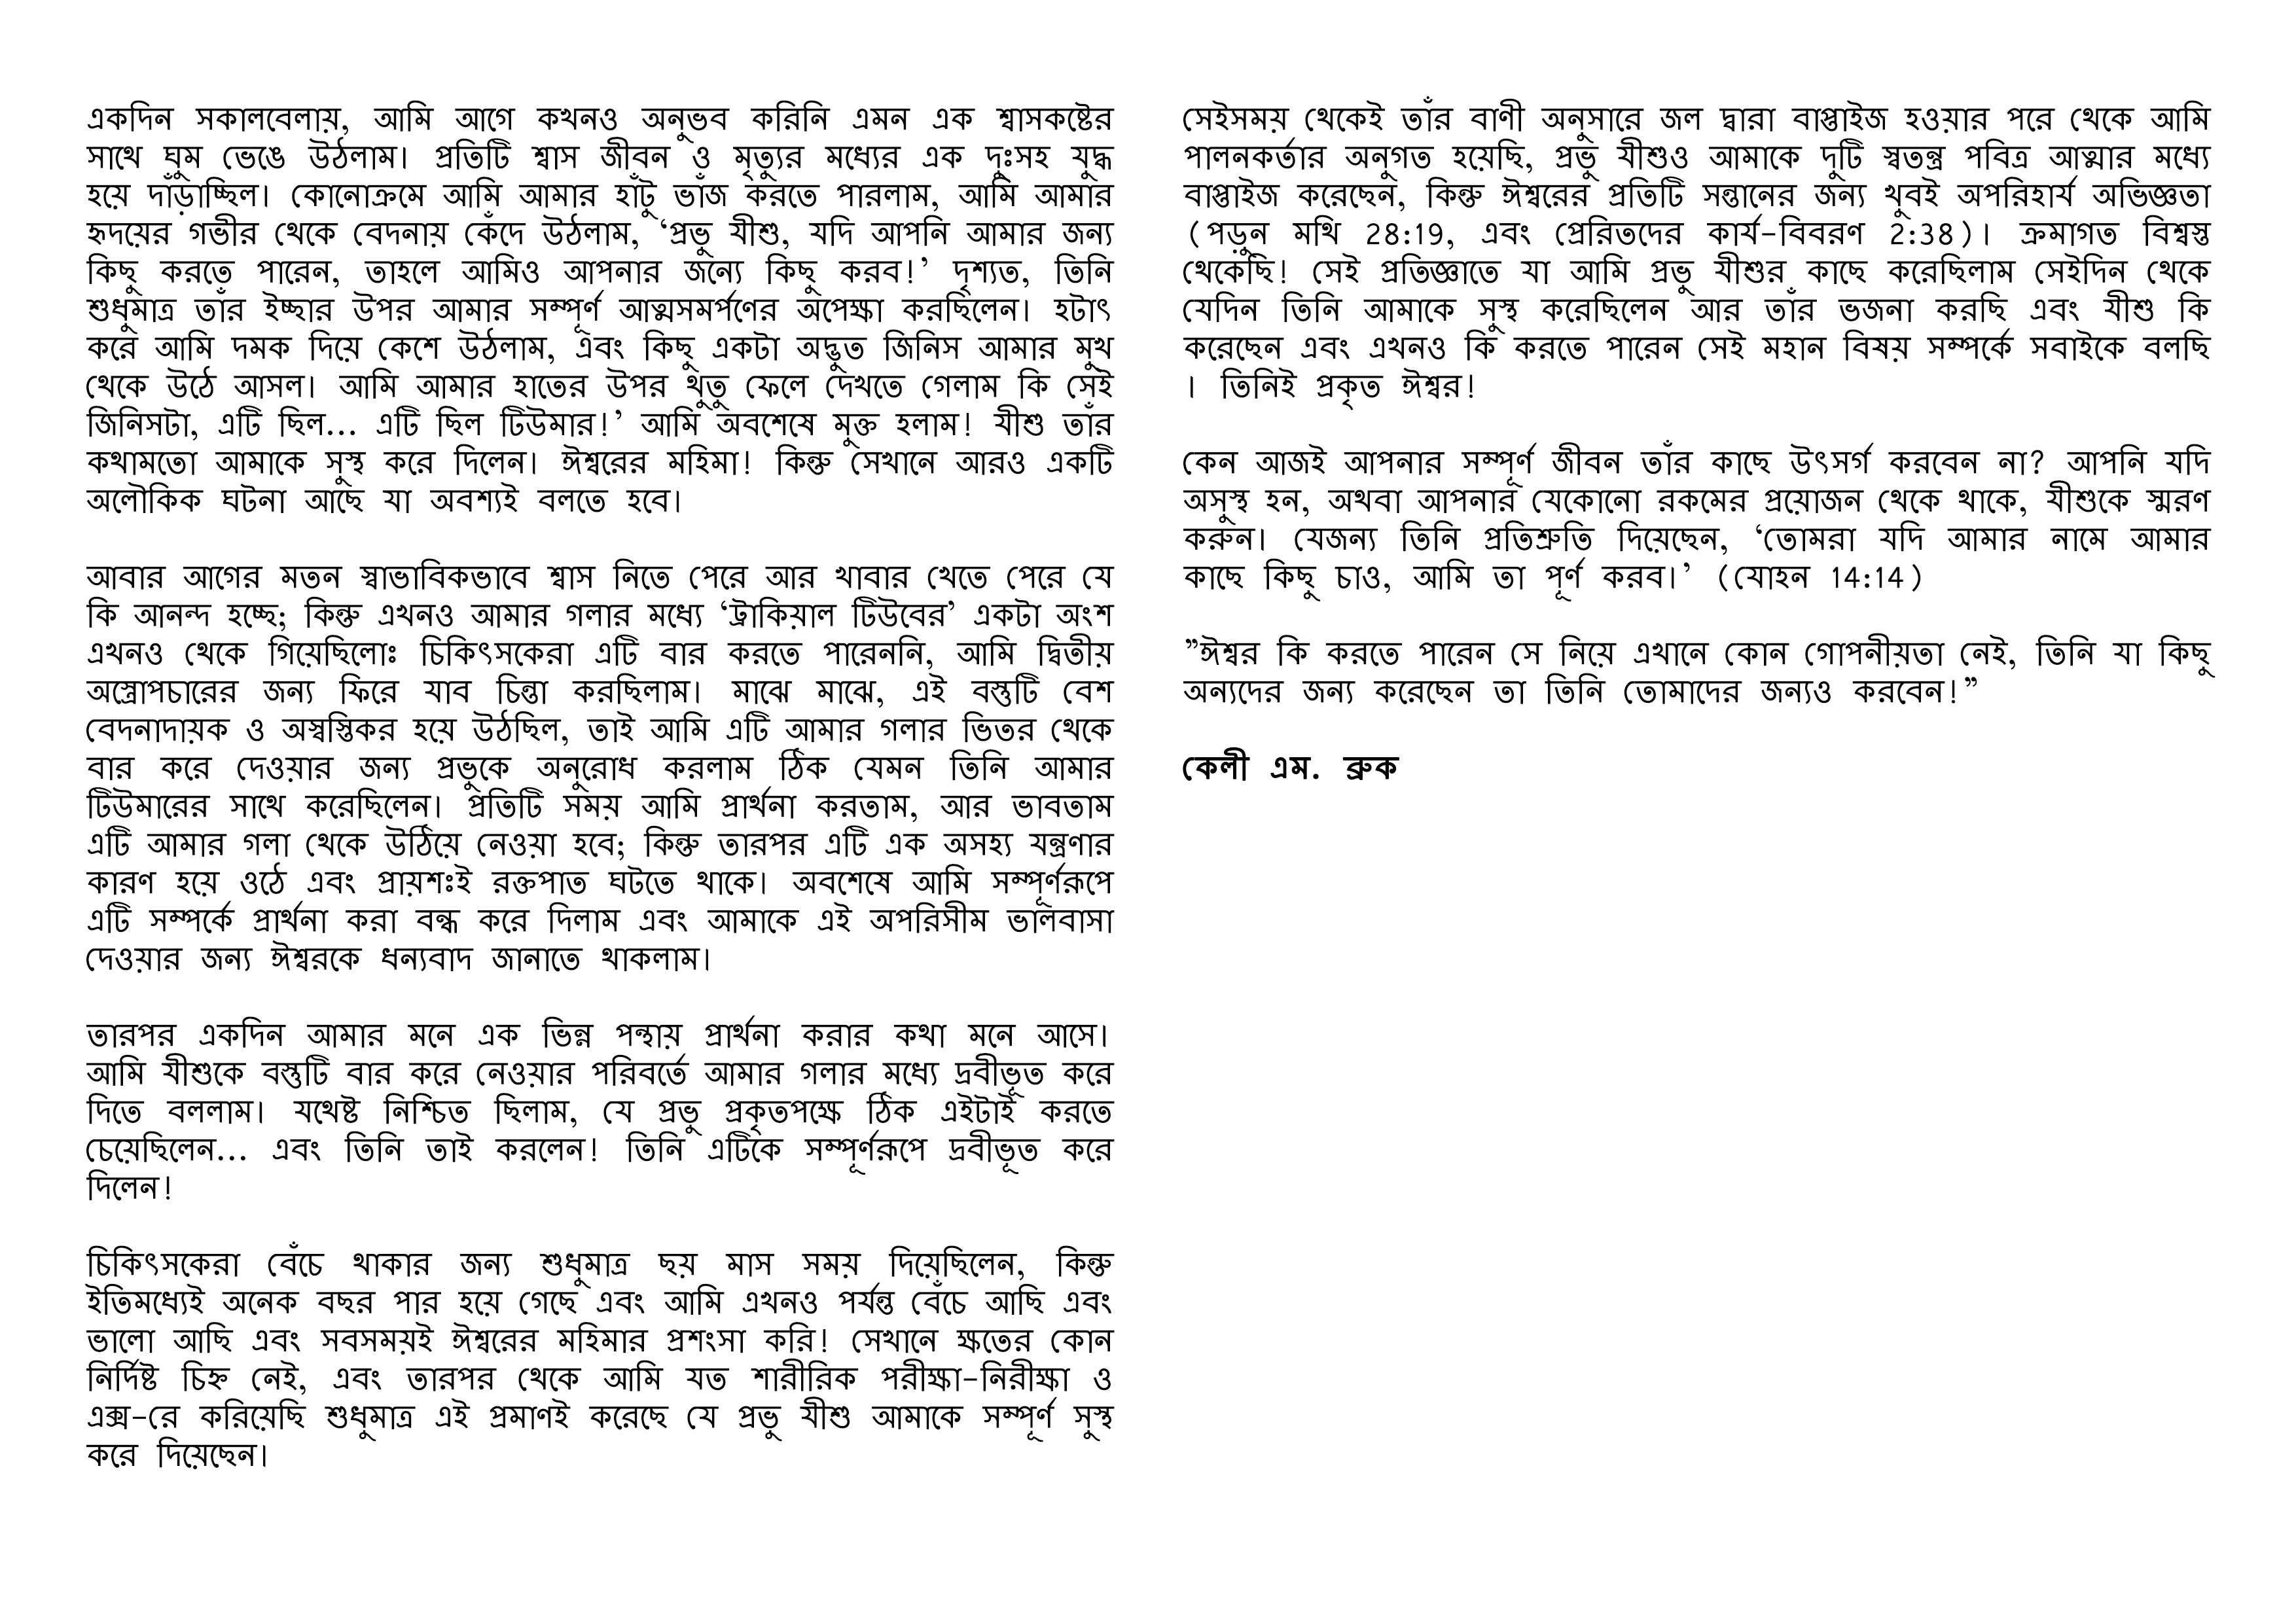 The-real-God-bengali-page-31